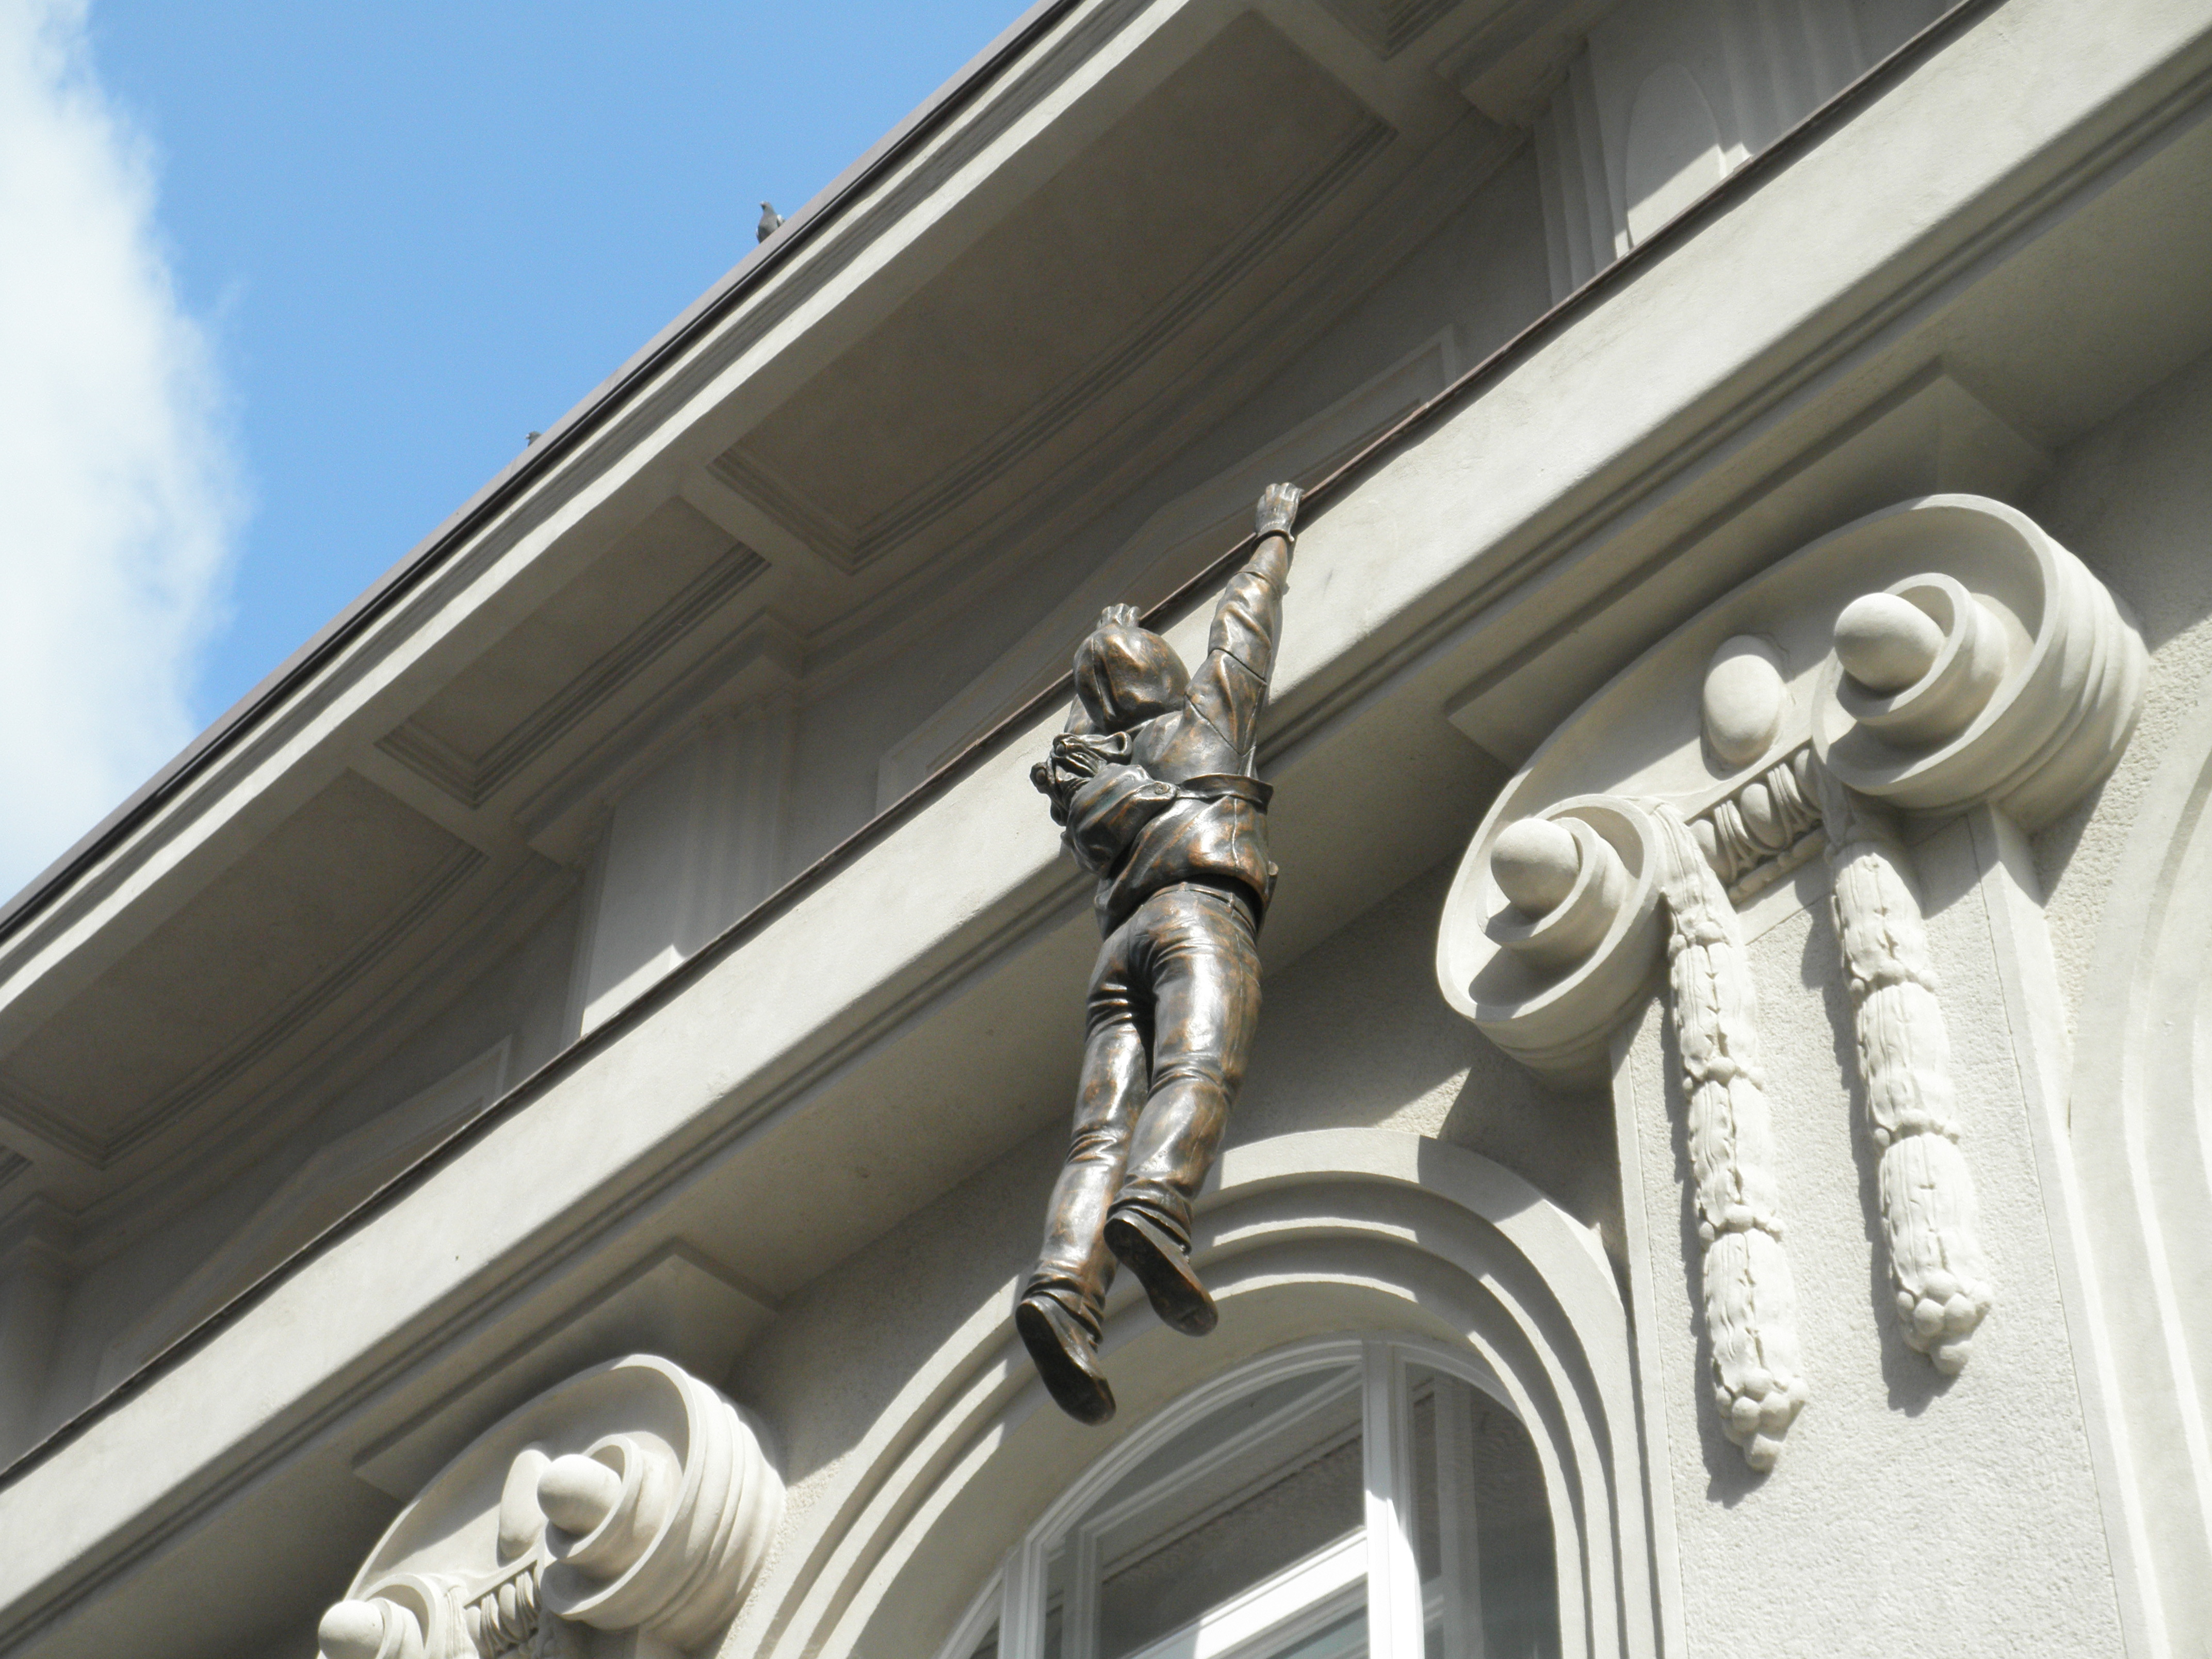 File:Statue Thief by David Cerny.jpg